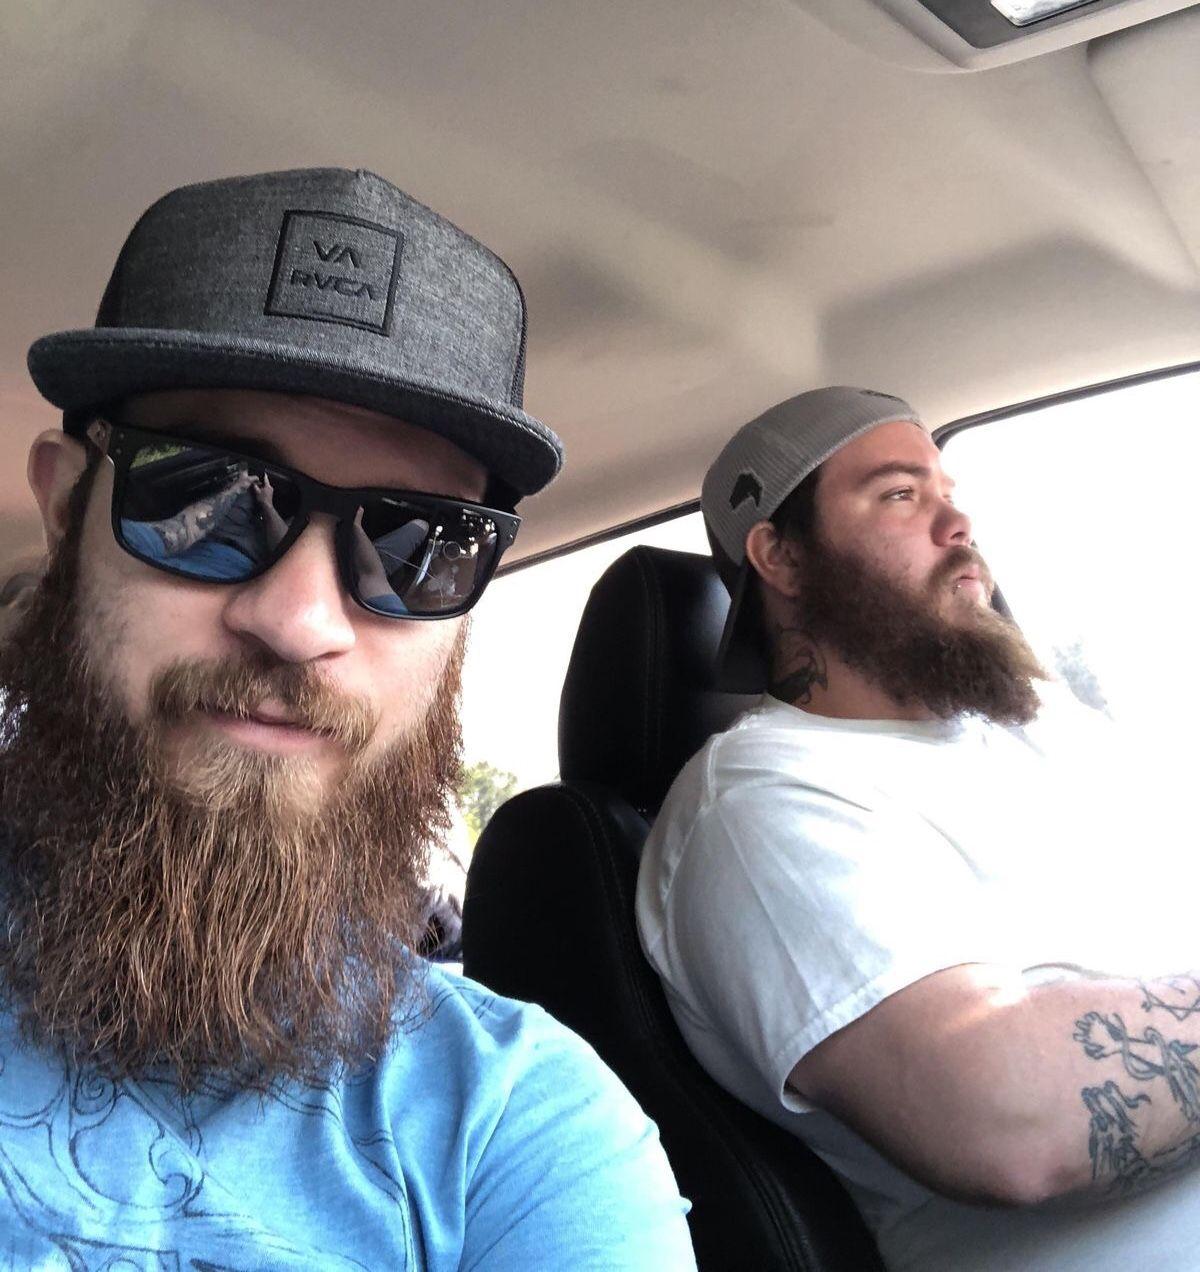 1506f87684b Pin by Mike Baer on Beard car selfies